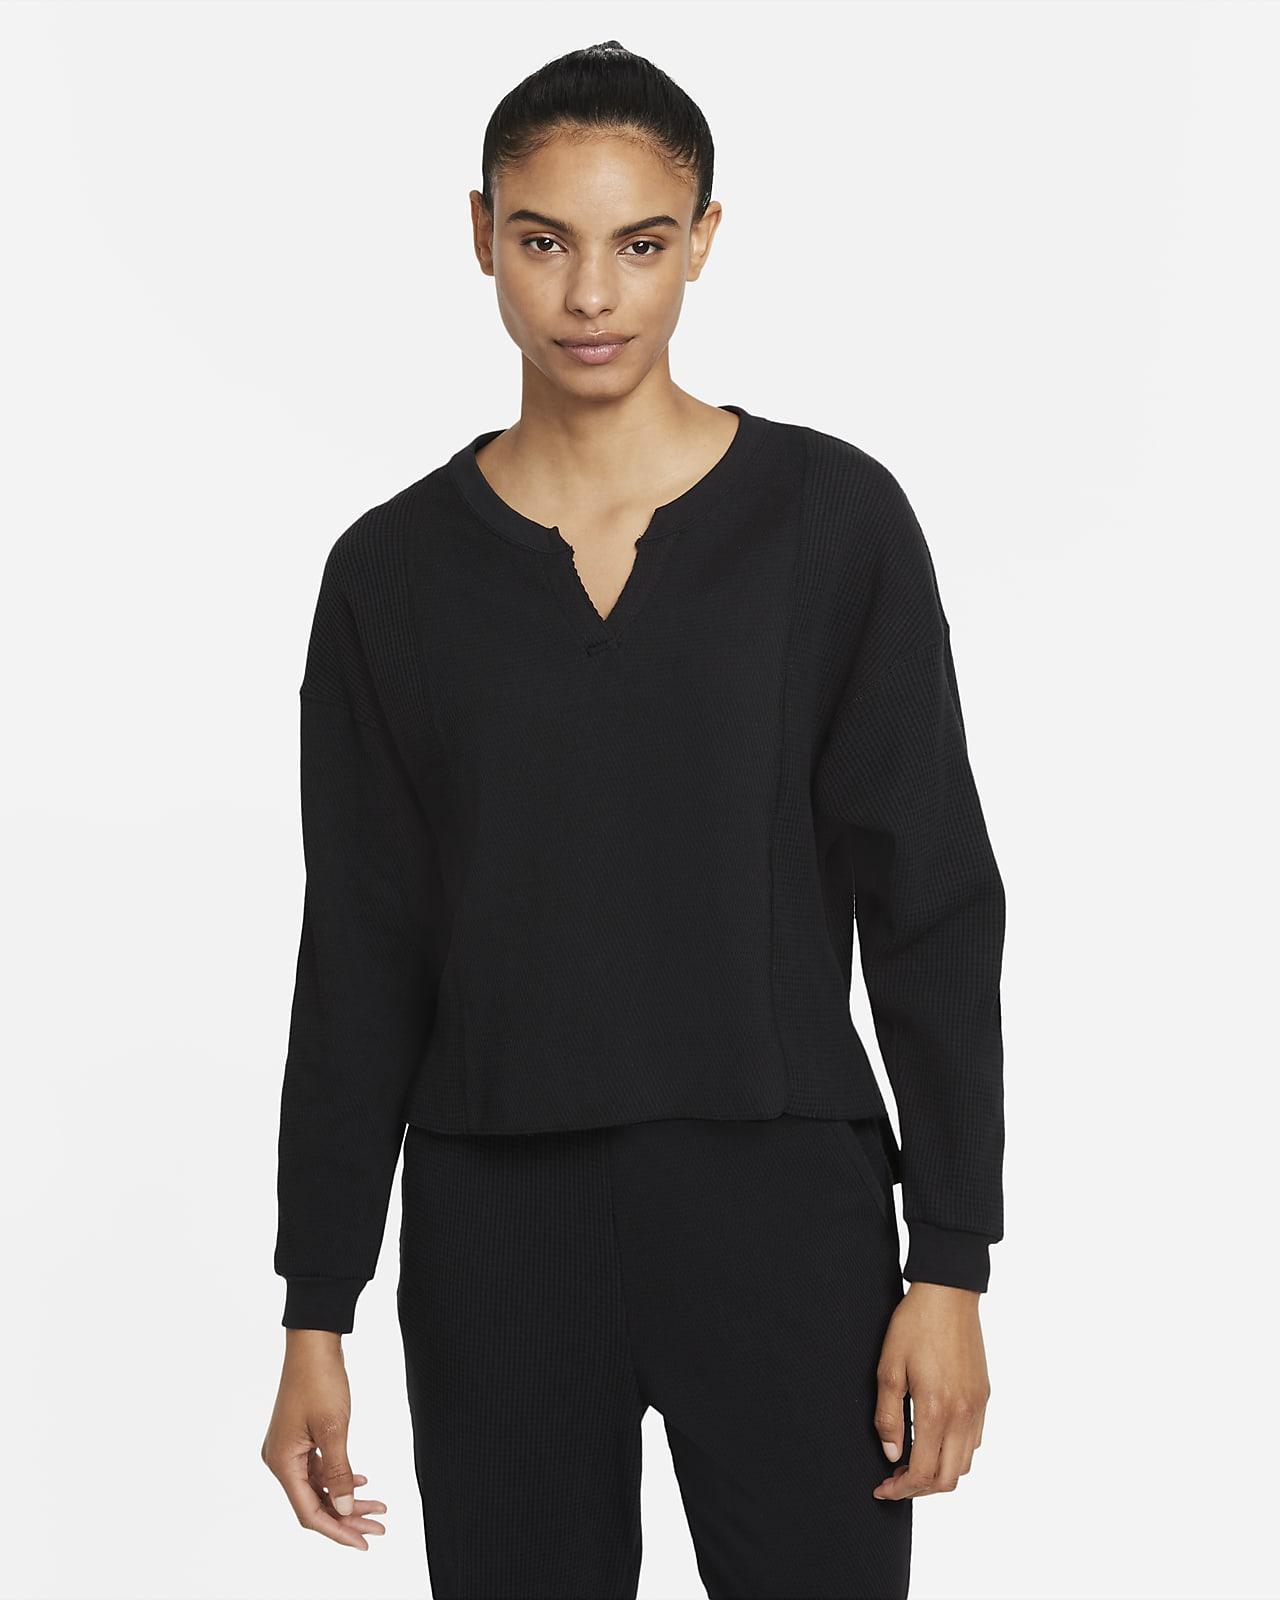 Nike Yoga Dri-FIT Luxe Cover-Up für Damen